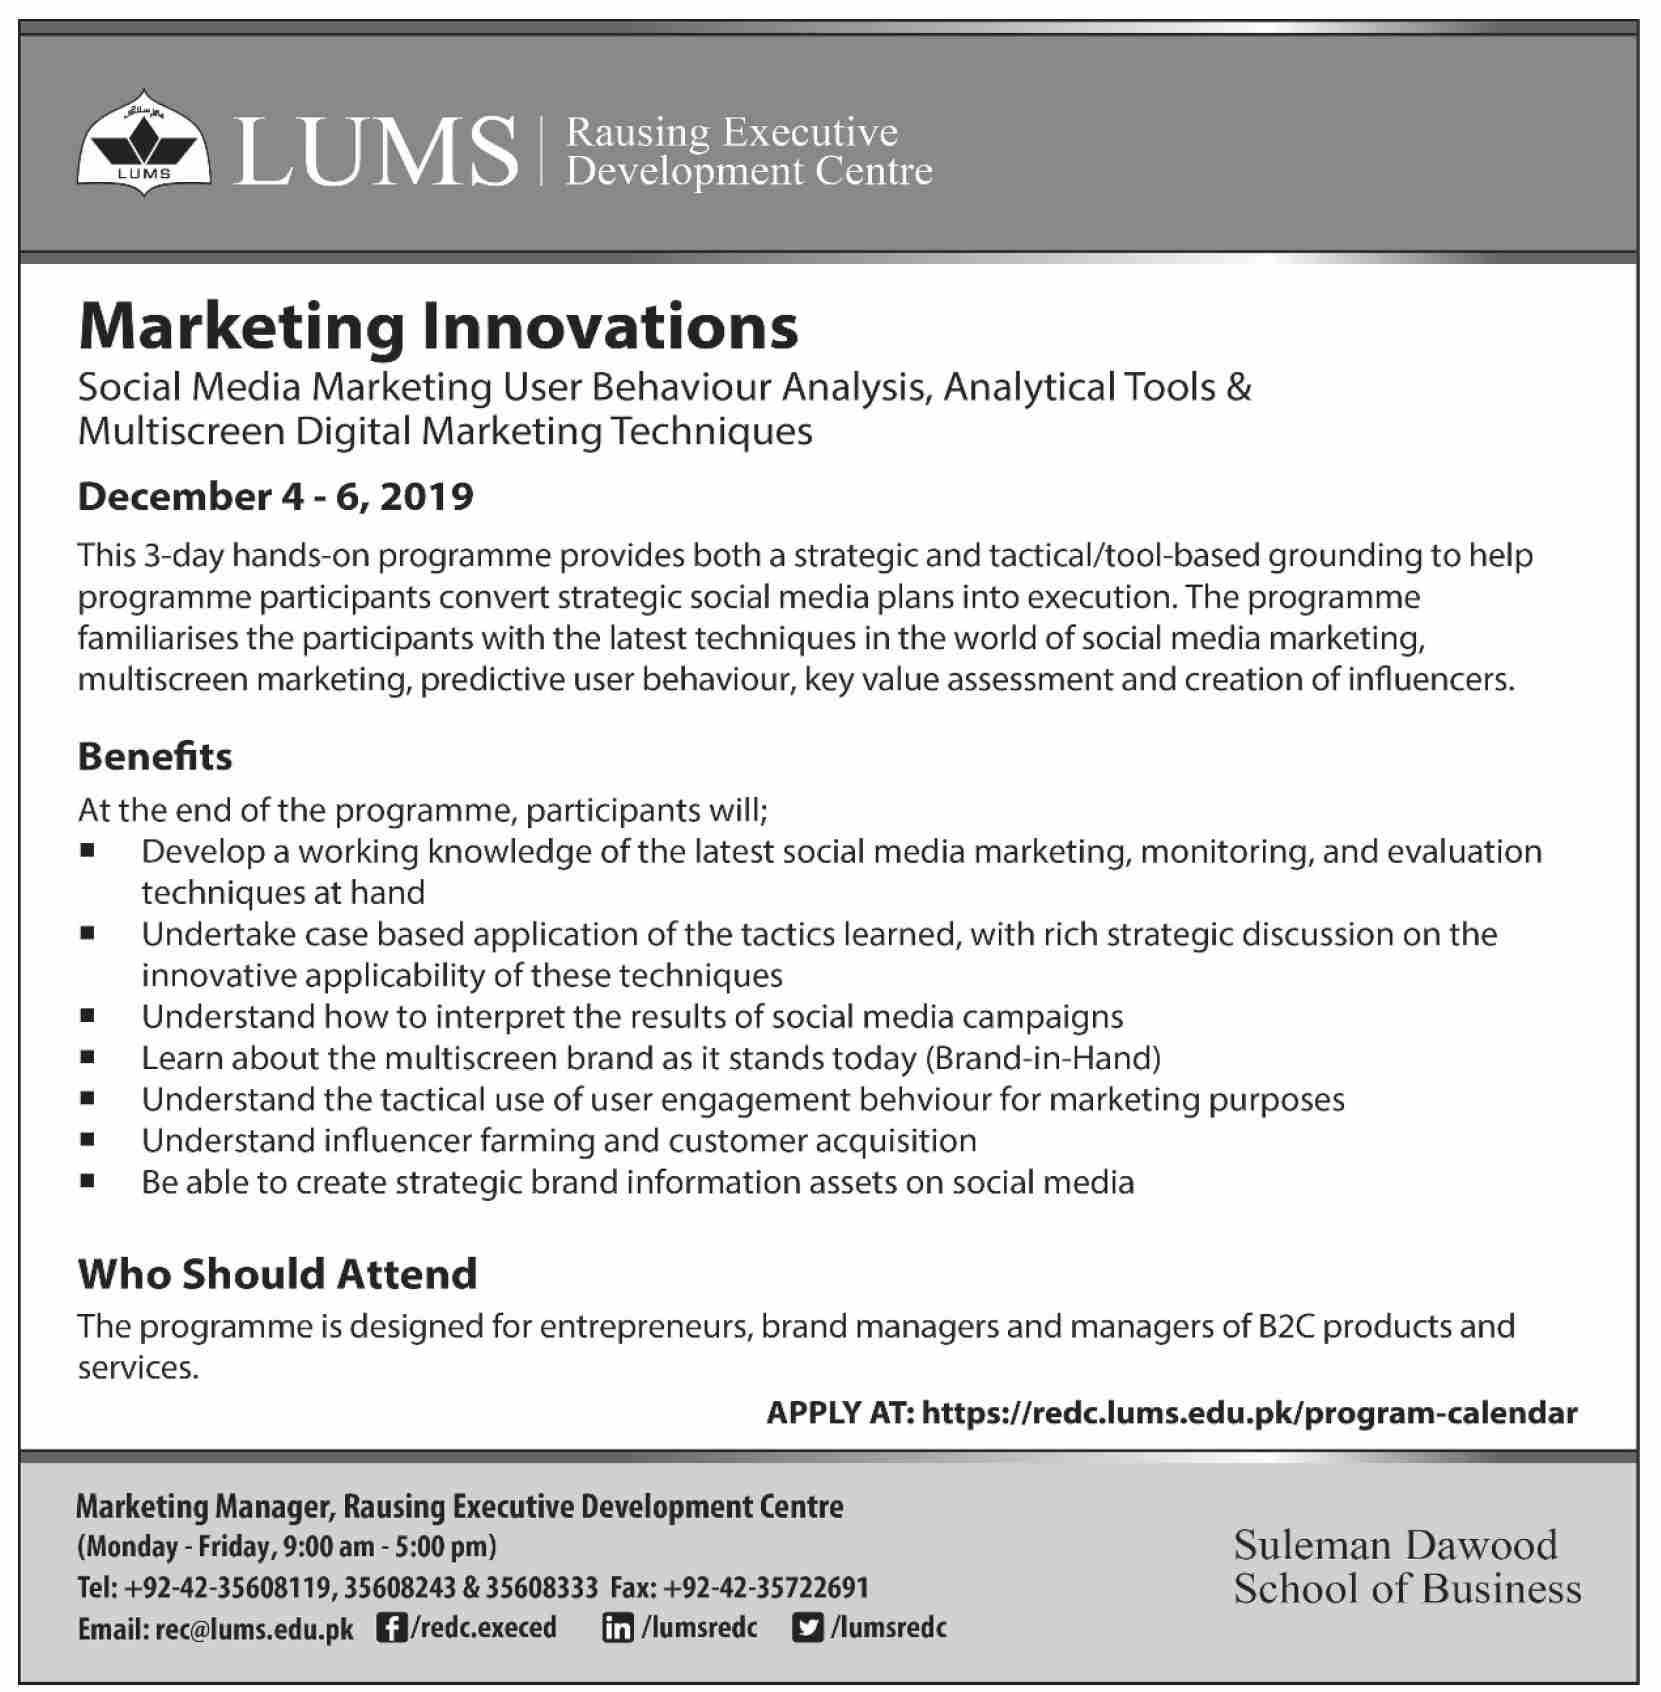 teacher evaluation form lums  LUMS Marketing Innovations 7-Day Hands-On Program 7 ...